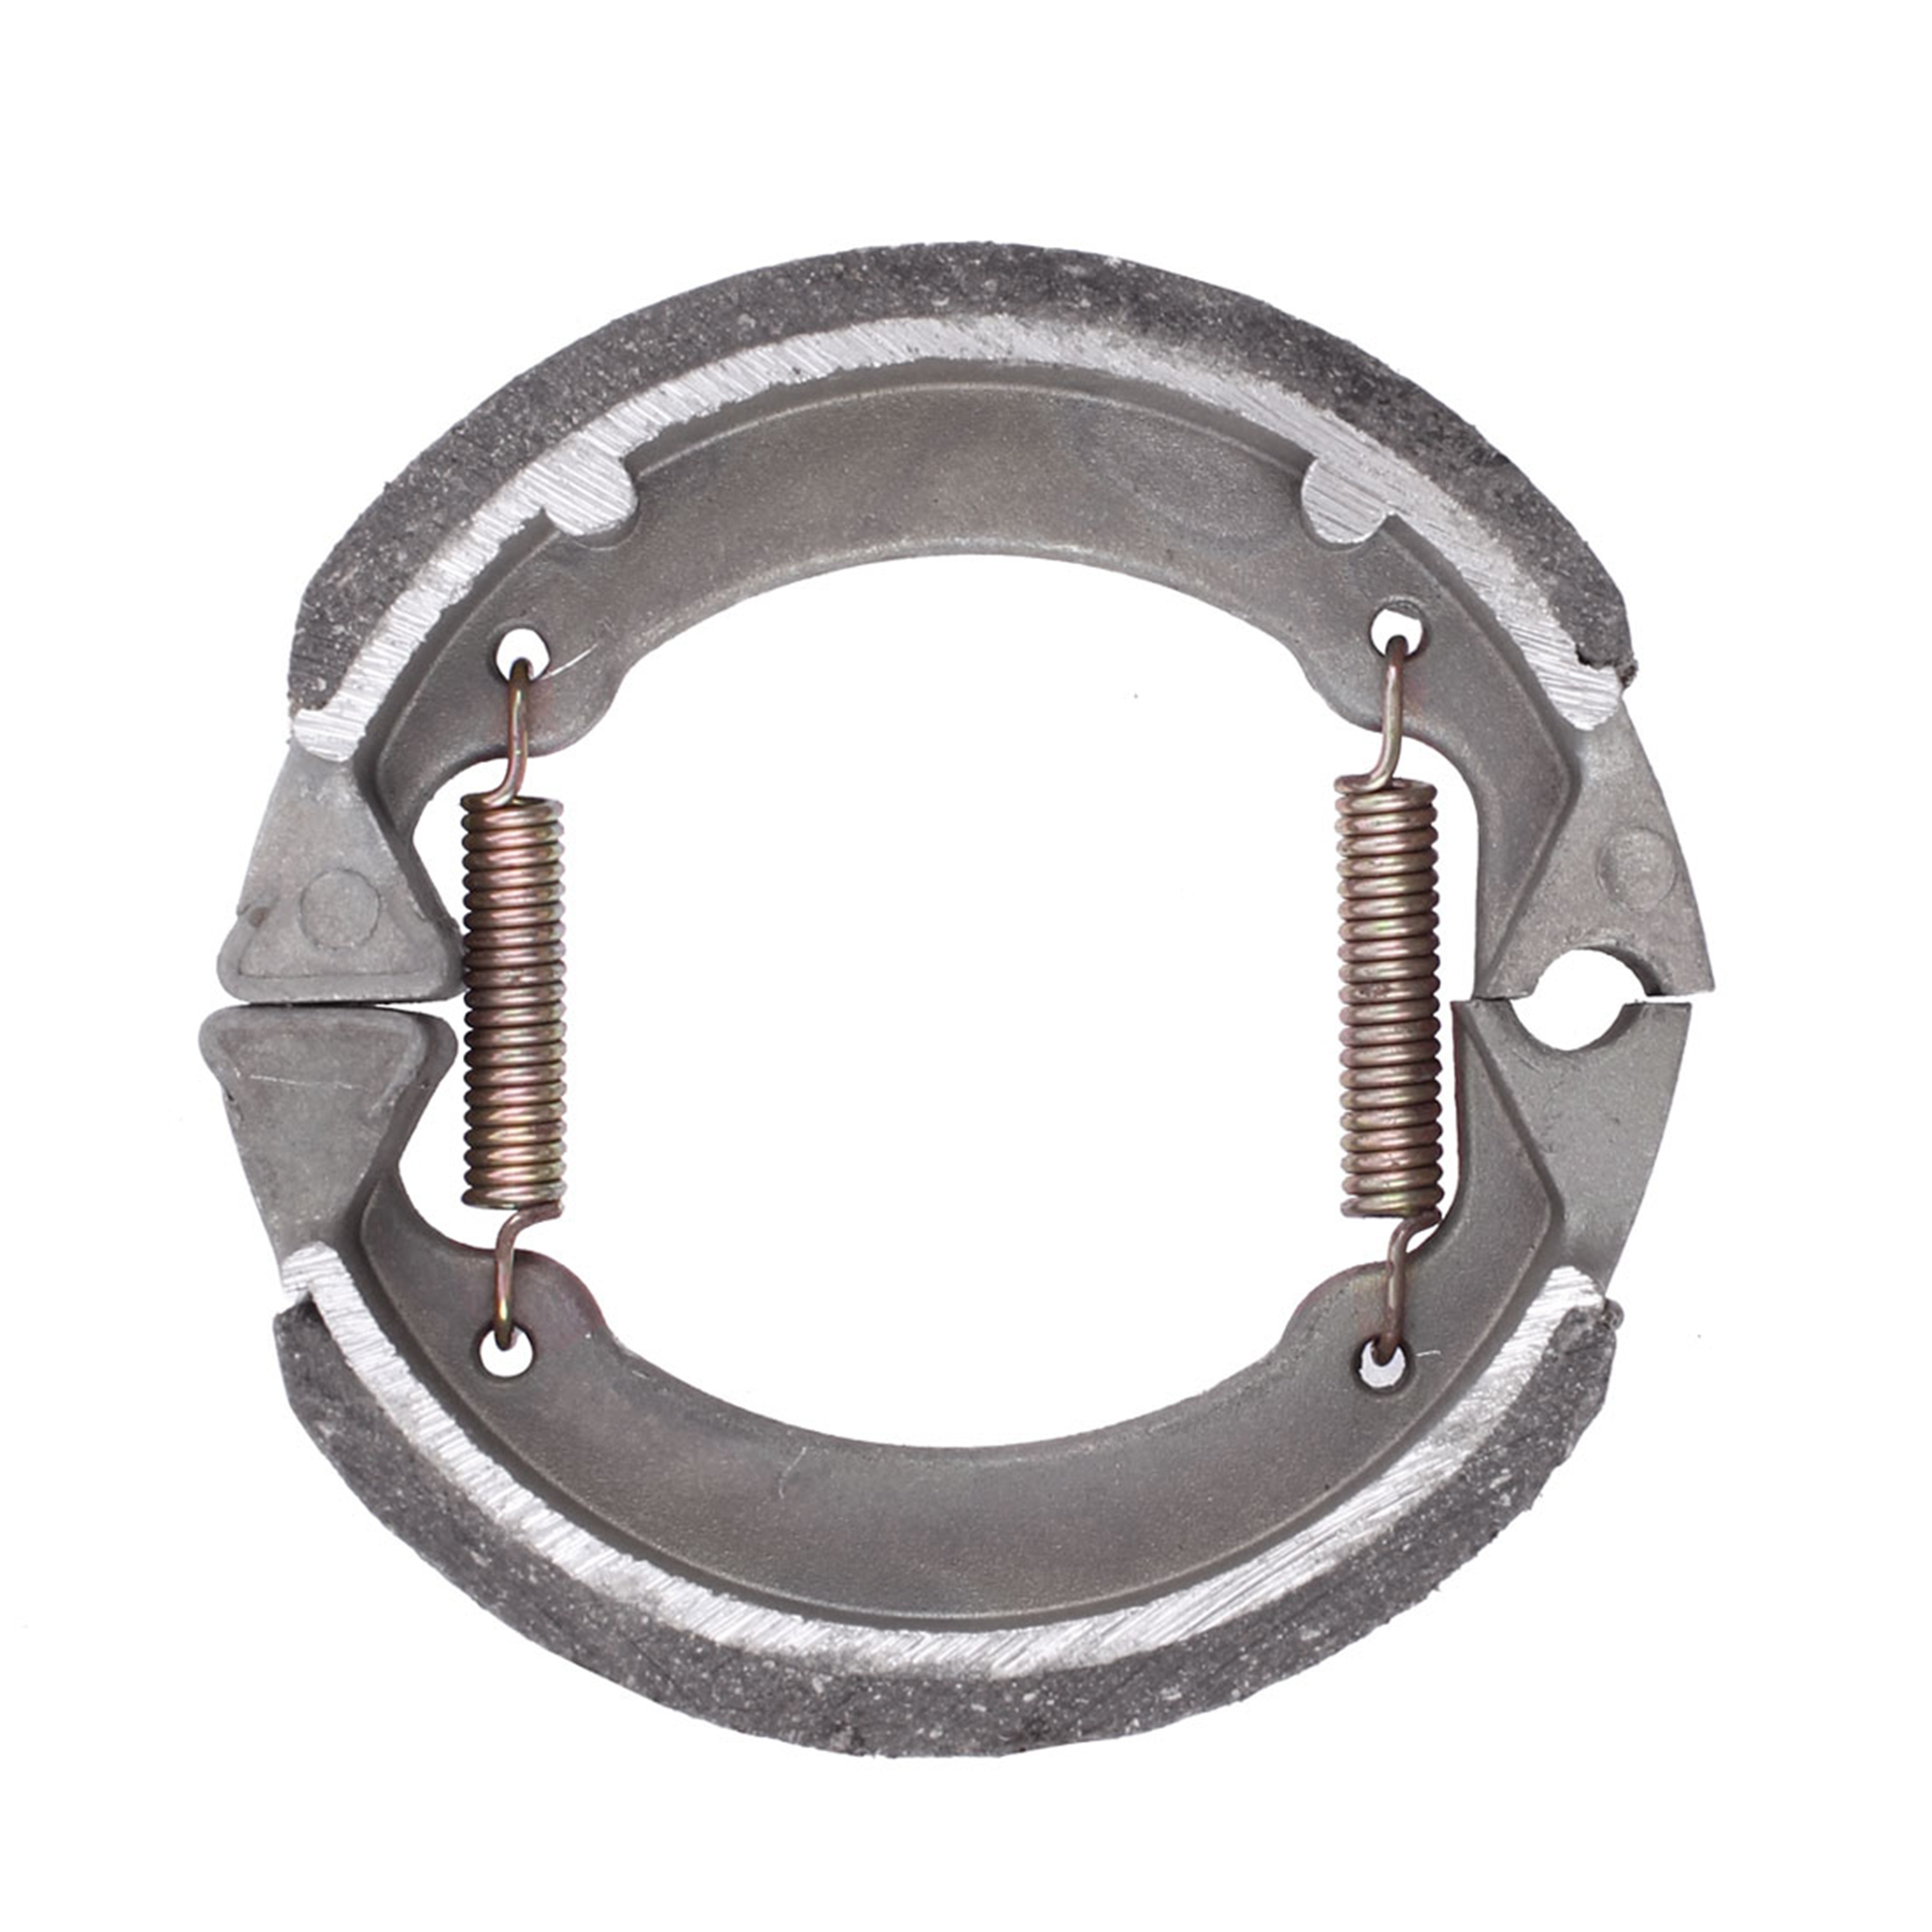 Metal Spring Motorcycle Motorbike Brake Shoe Drum Pad 75mm x 75mm x 20mm